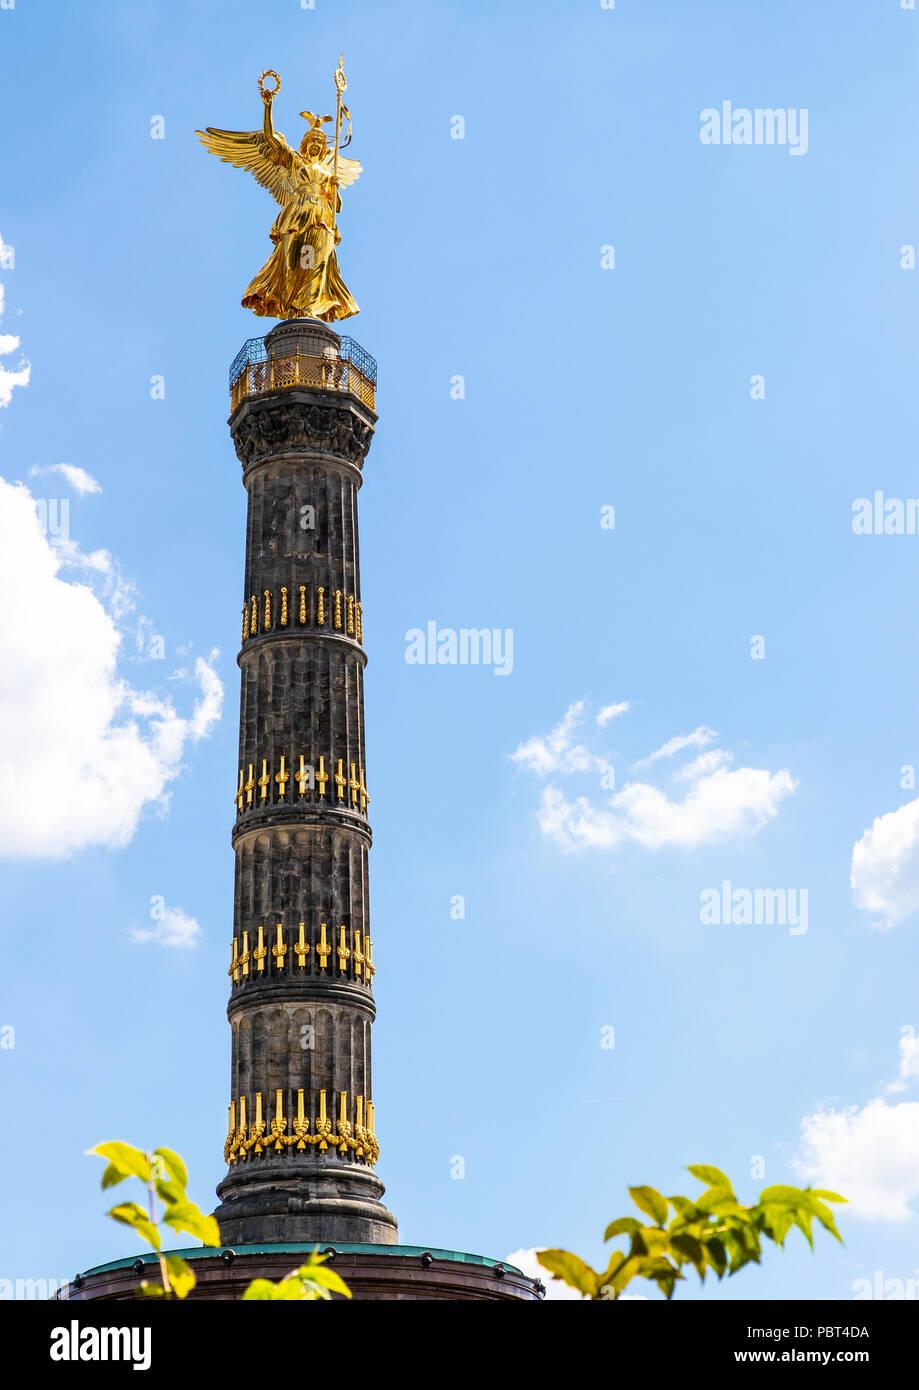 Statue of Victoria, on the Victory Column or Siegessaule, Tiergarten Park, Boulevard Strasse 17 Juni, Berlin - Stock Image